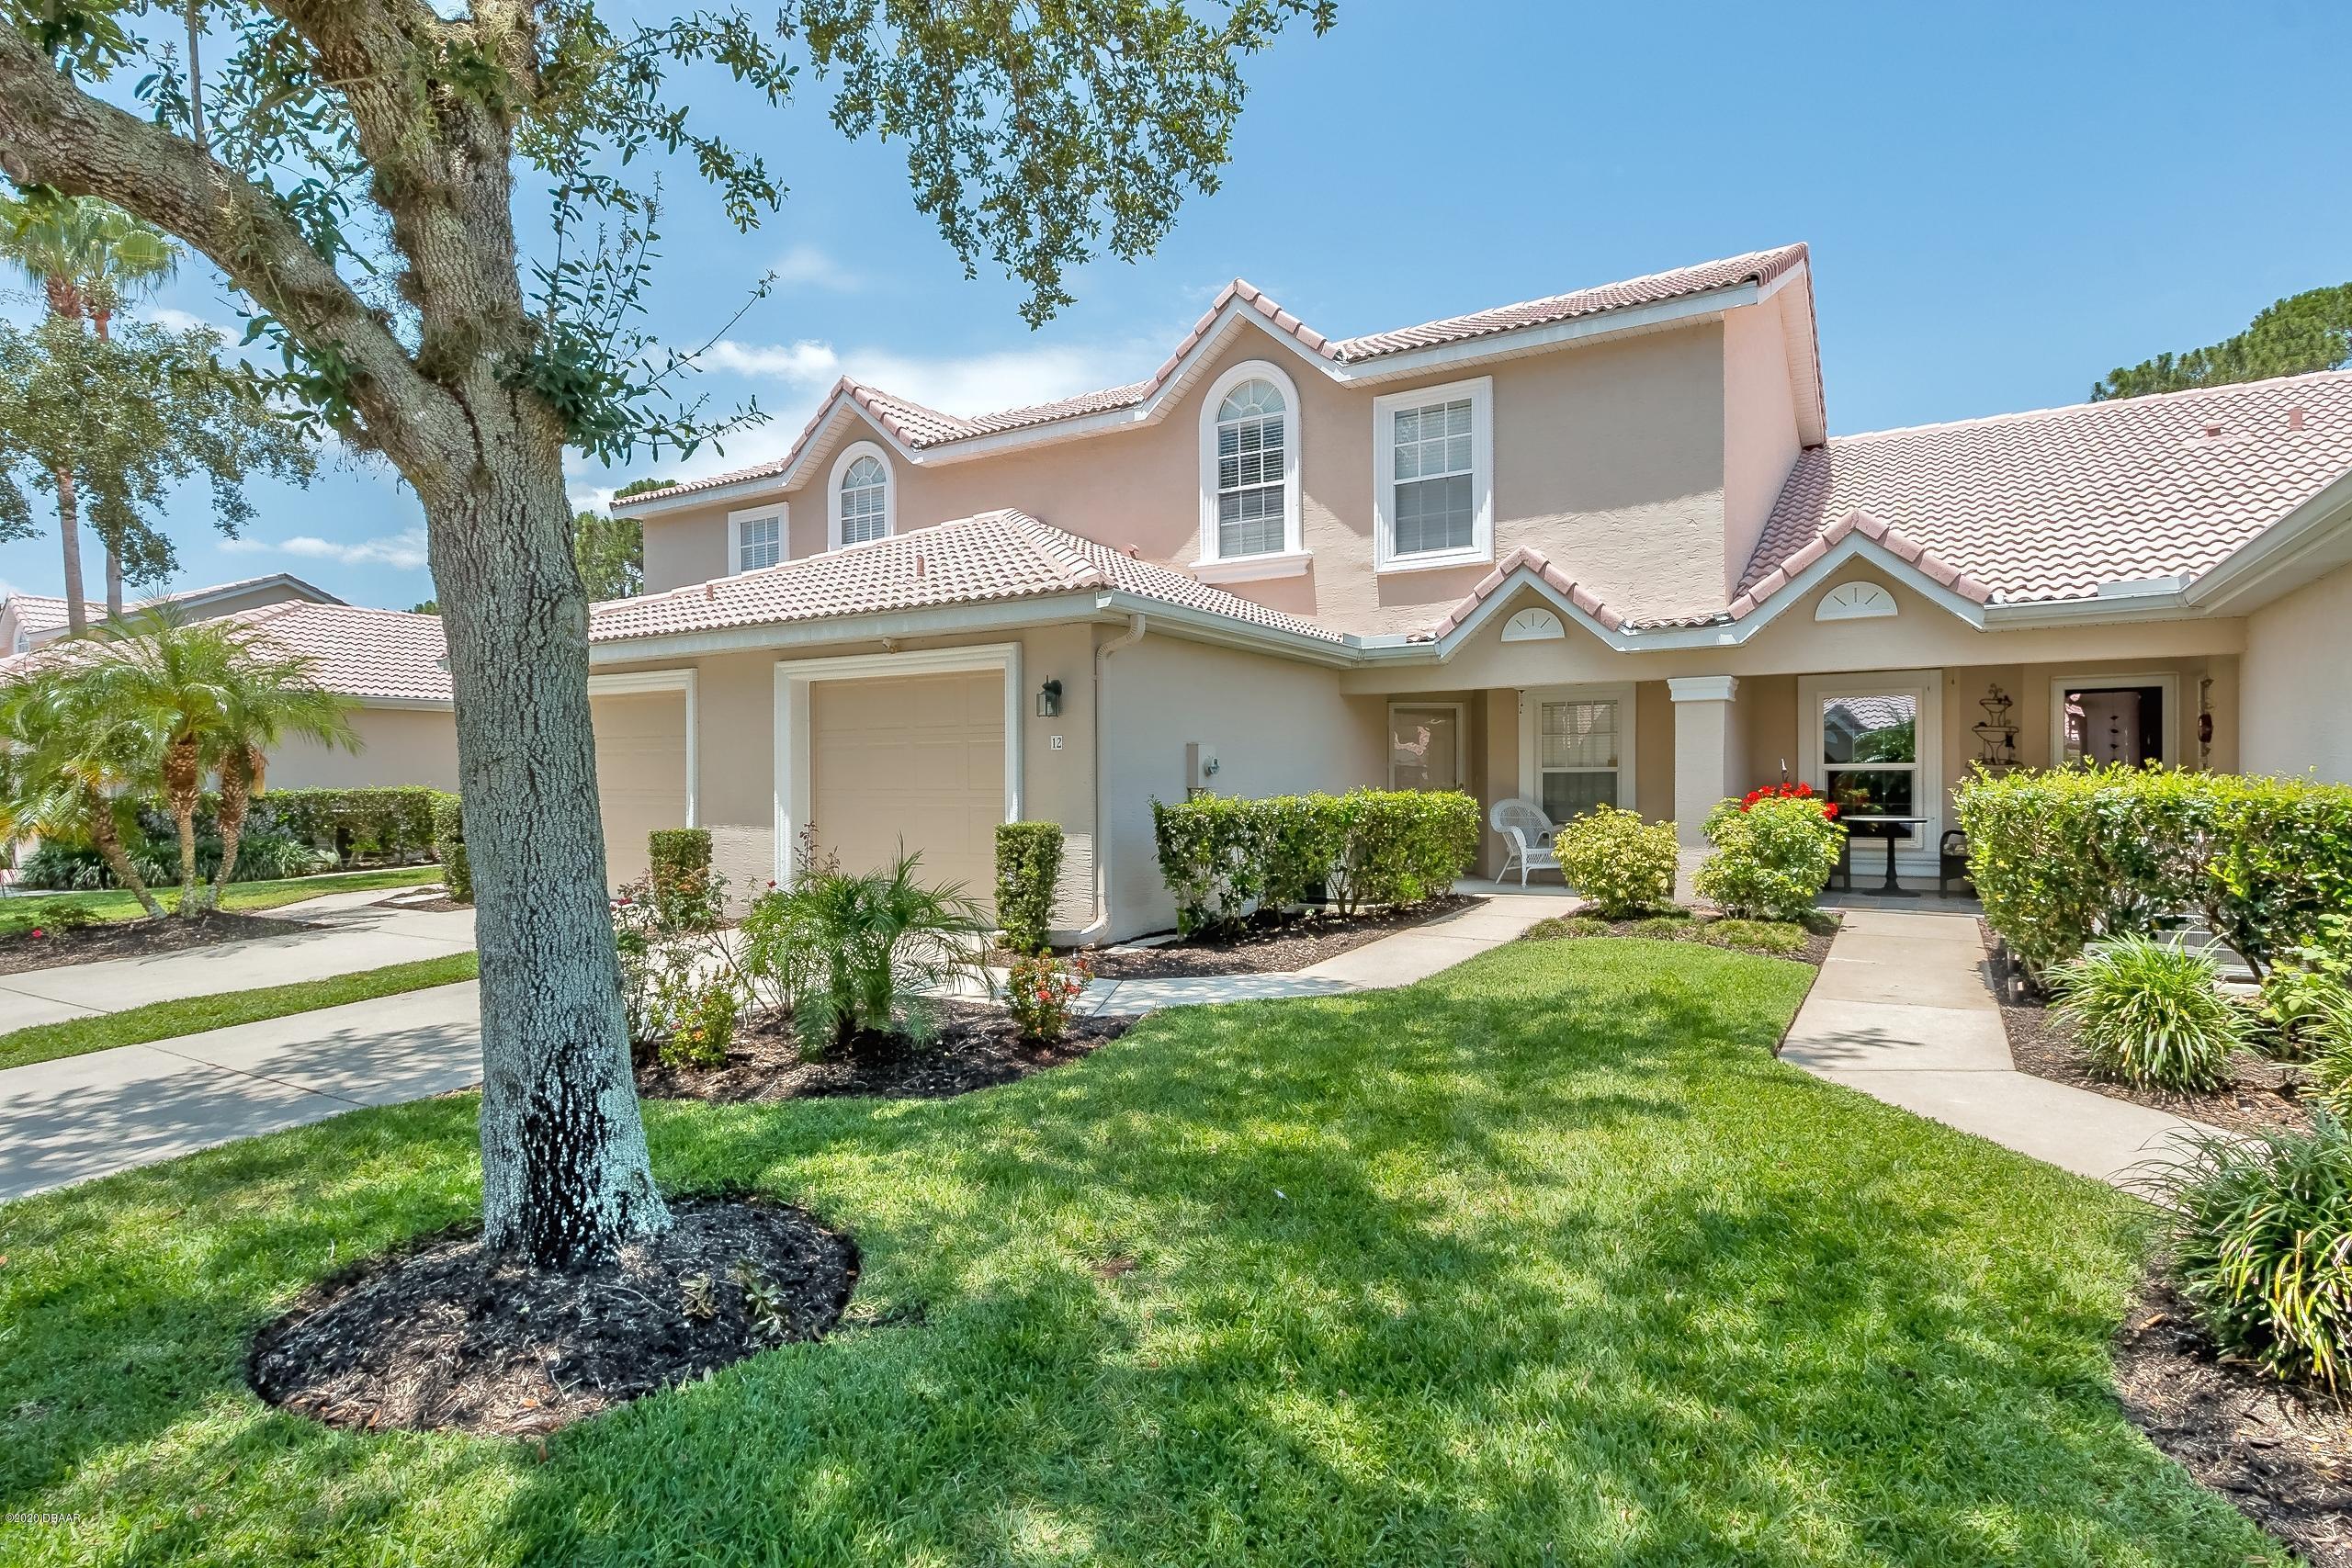 Photo of 12 Golf Villa Drive, Port Orange, FL 32128